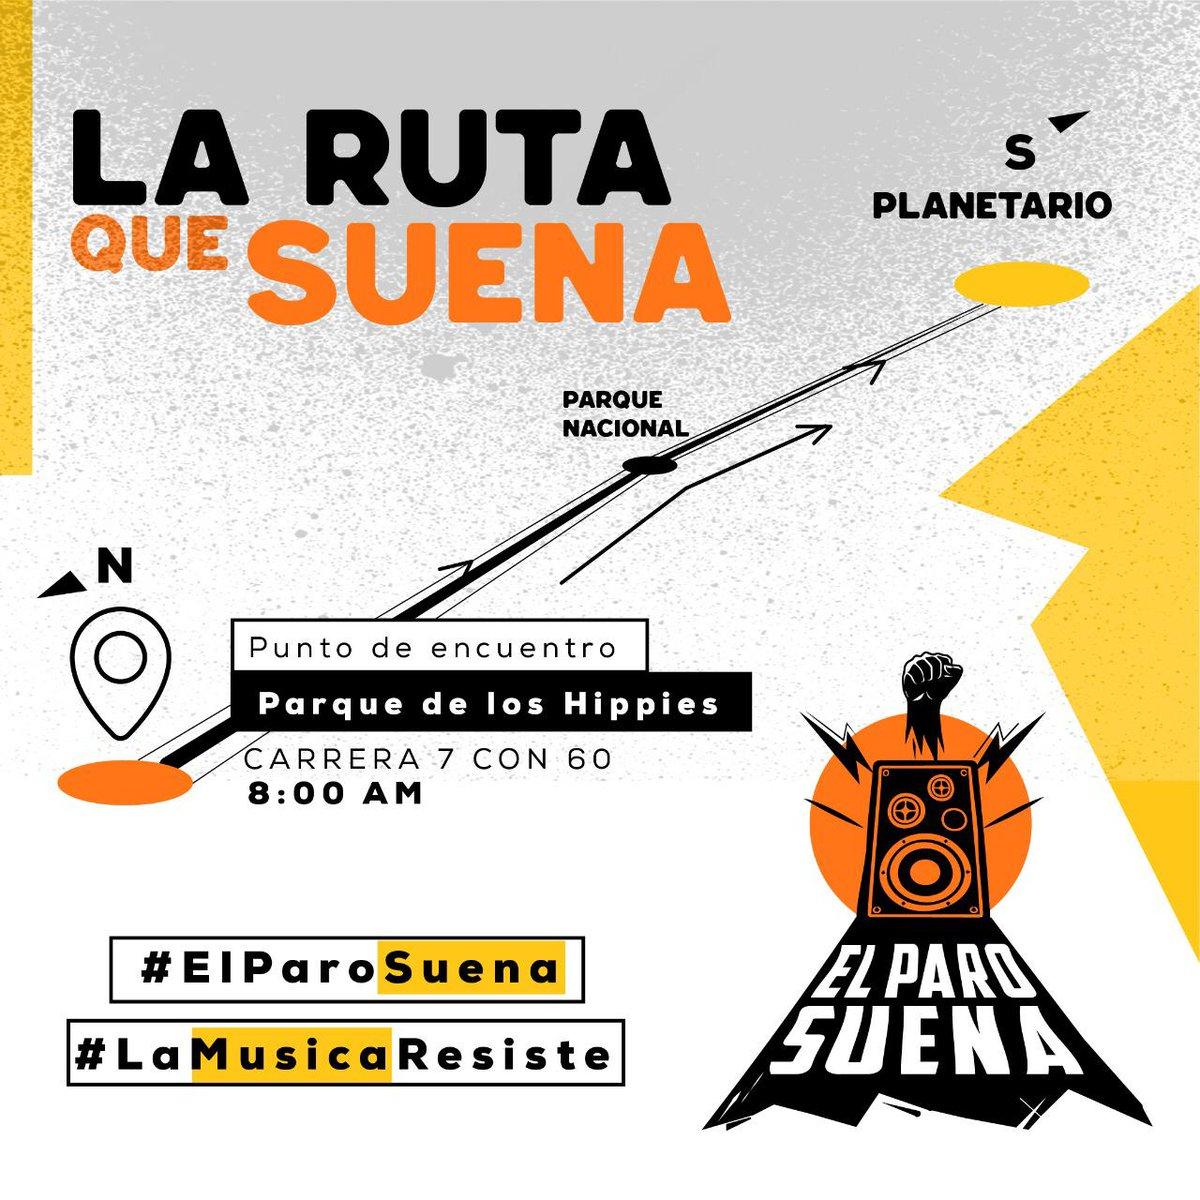 ¡Esta es la ruta que sonará! #NosUneLaMúsica  #21N #ElParoSuena #LaMúsicaResistepic.twitter.com/kVlTZgZukL